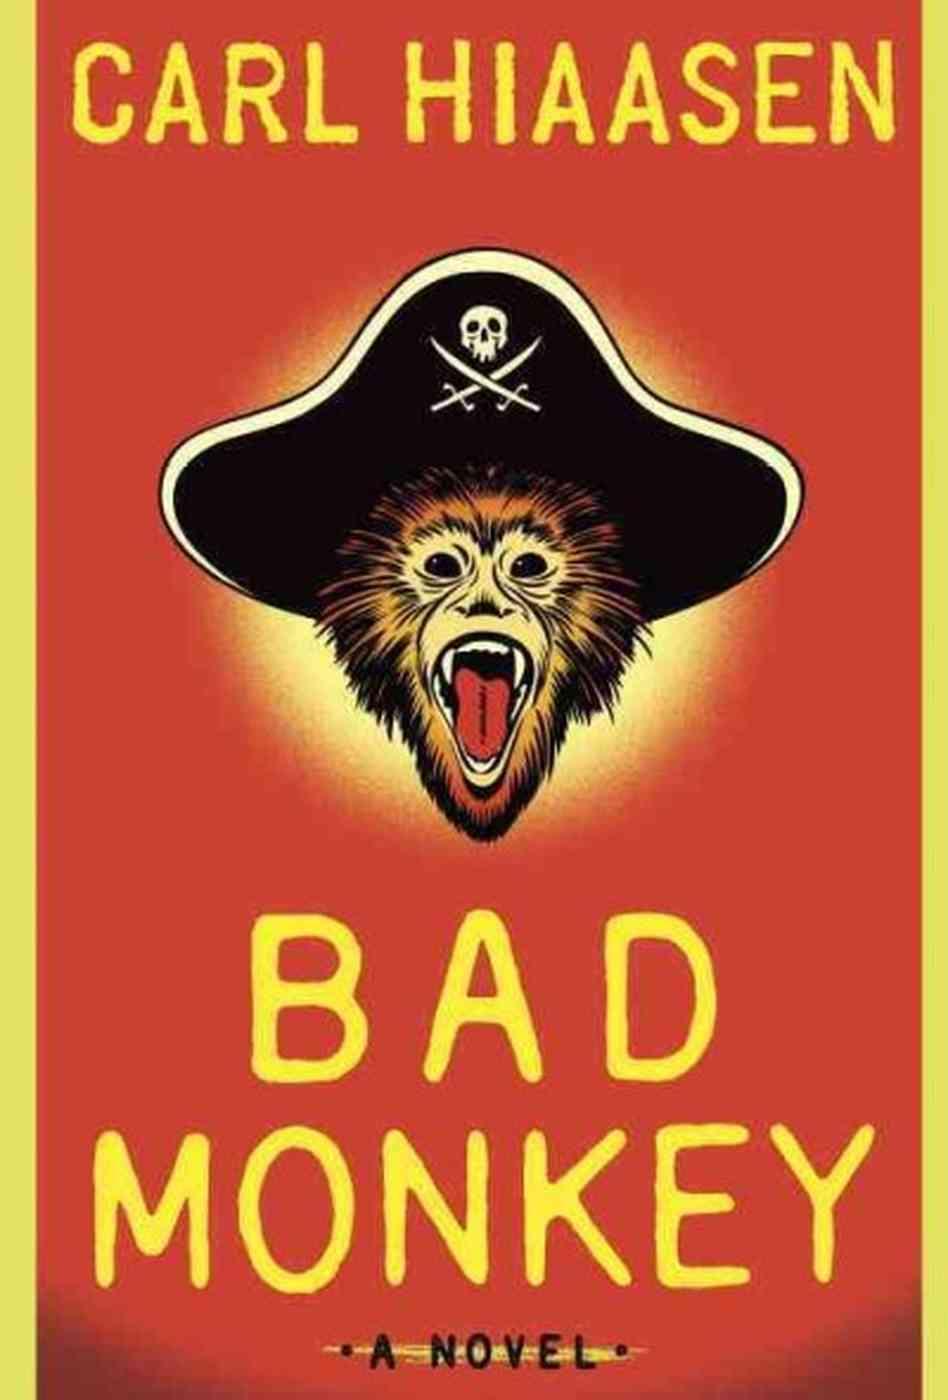 Carl Hiaasen's BAD MONKEY, now in paperback!